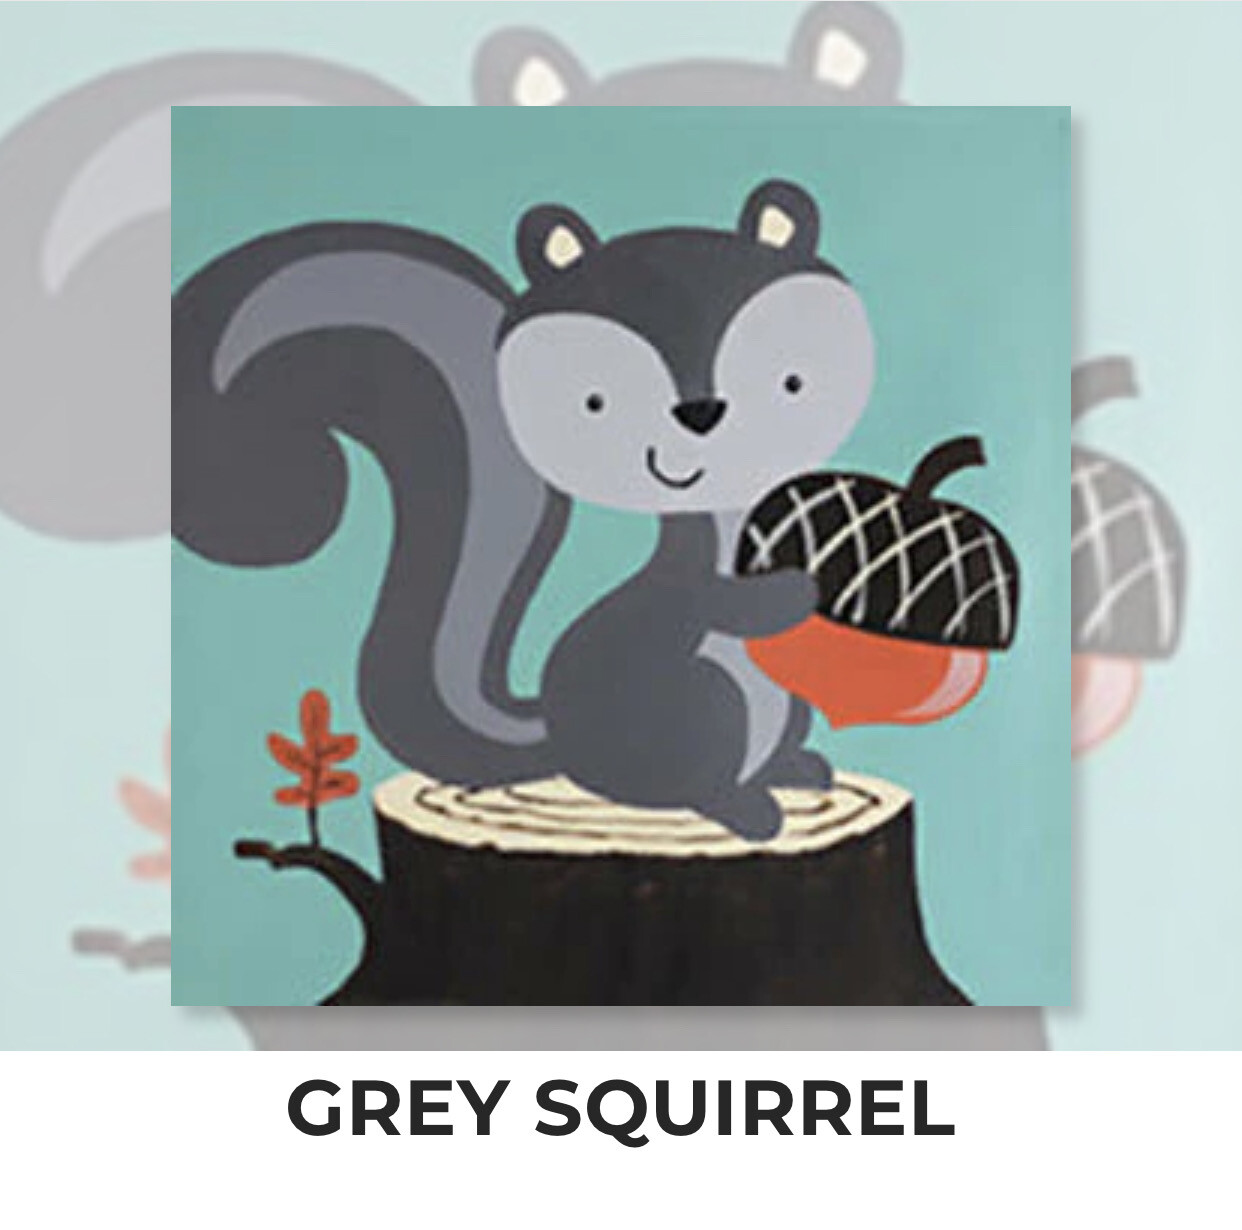 Grey Squirrel KIDS Acrylic Paint On Canvas DIY Art Kit - 3 Week Special Order